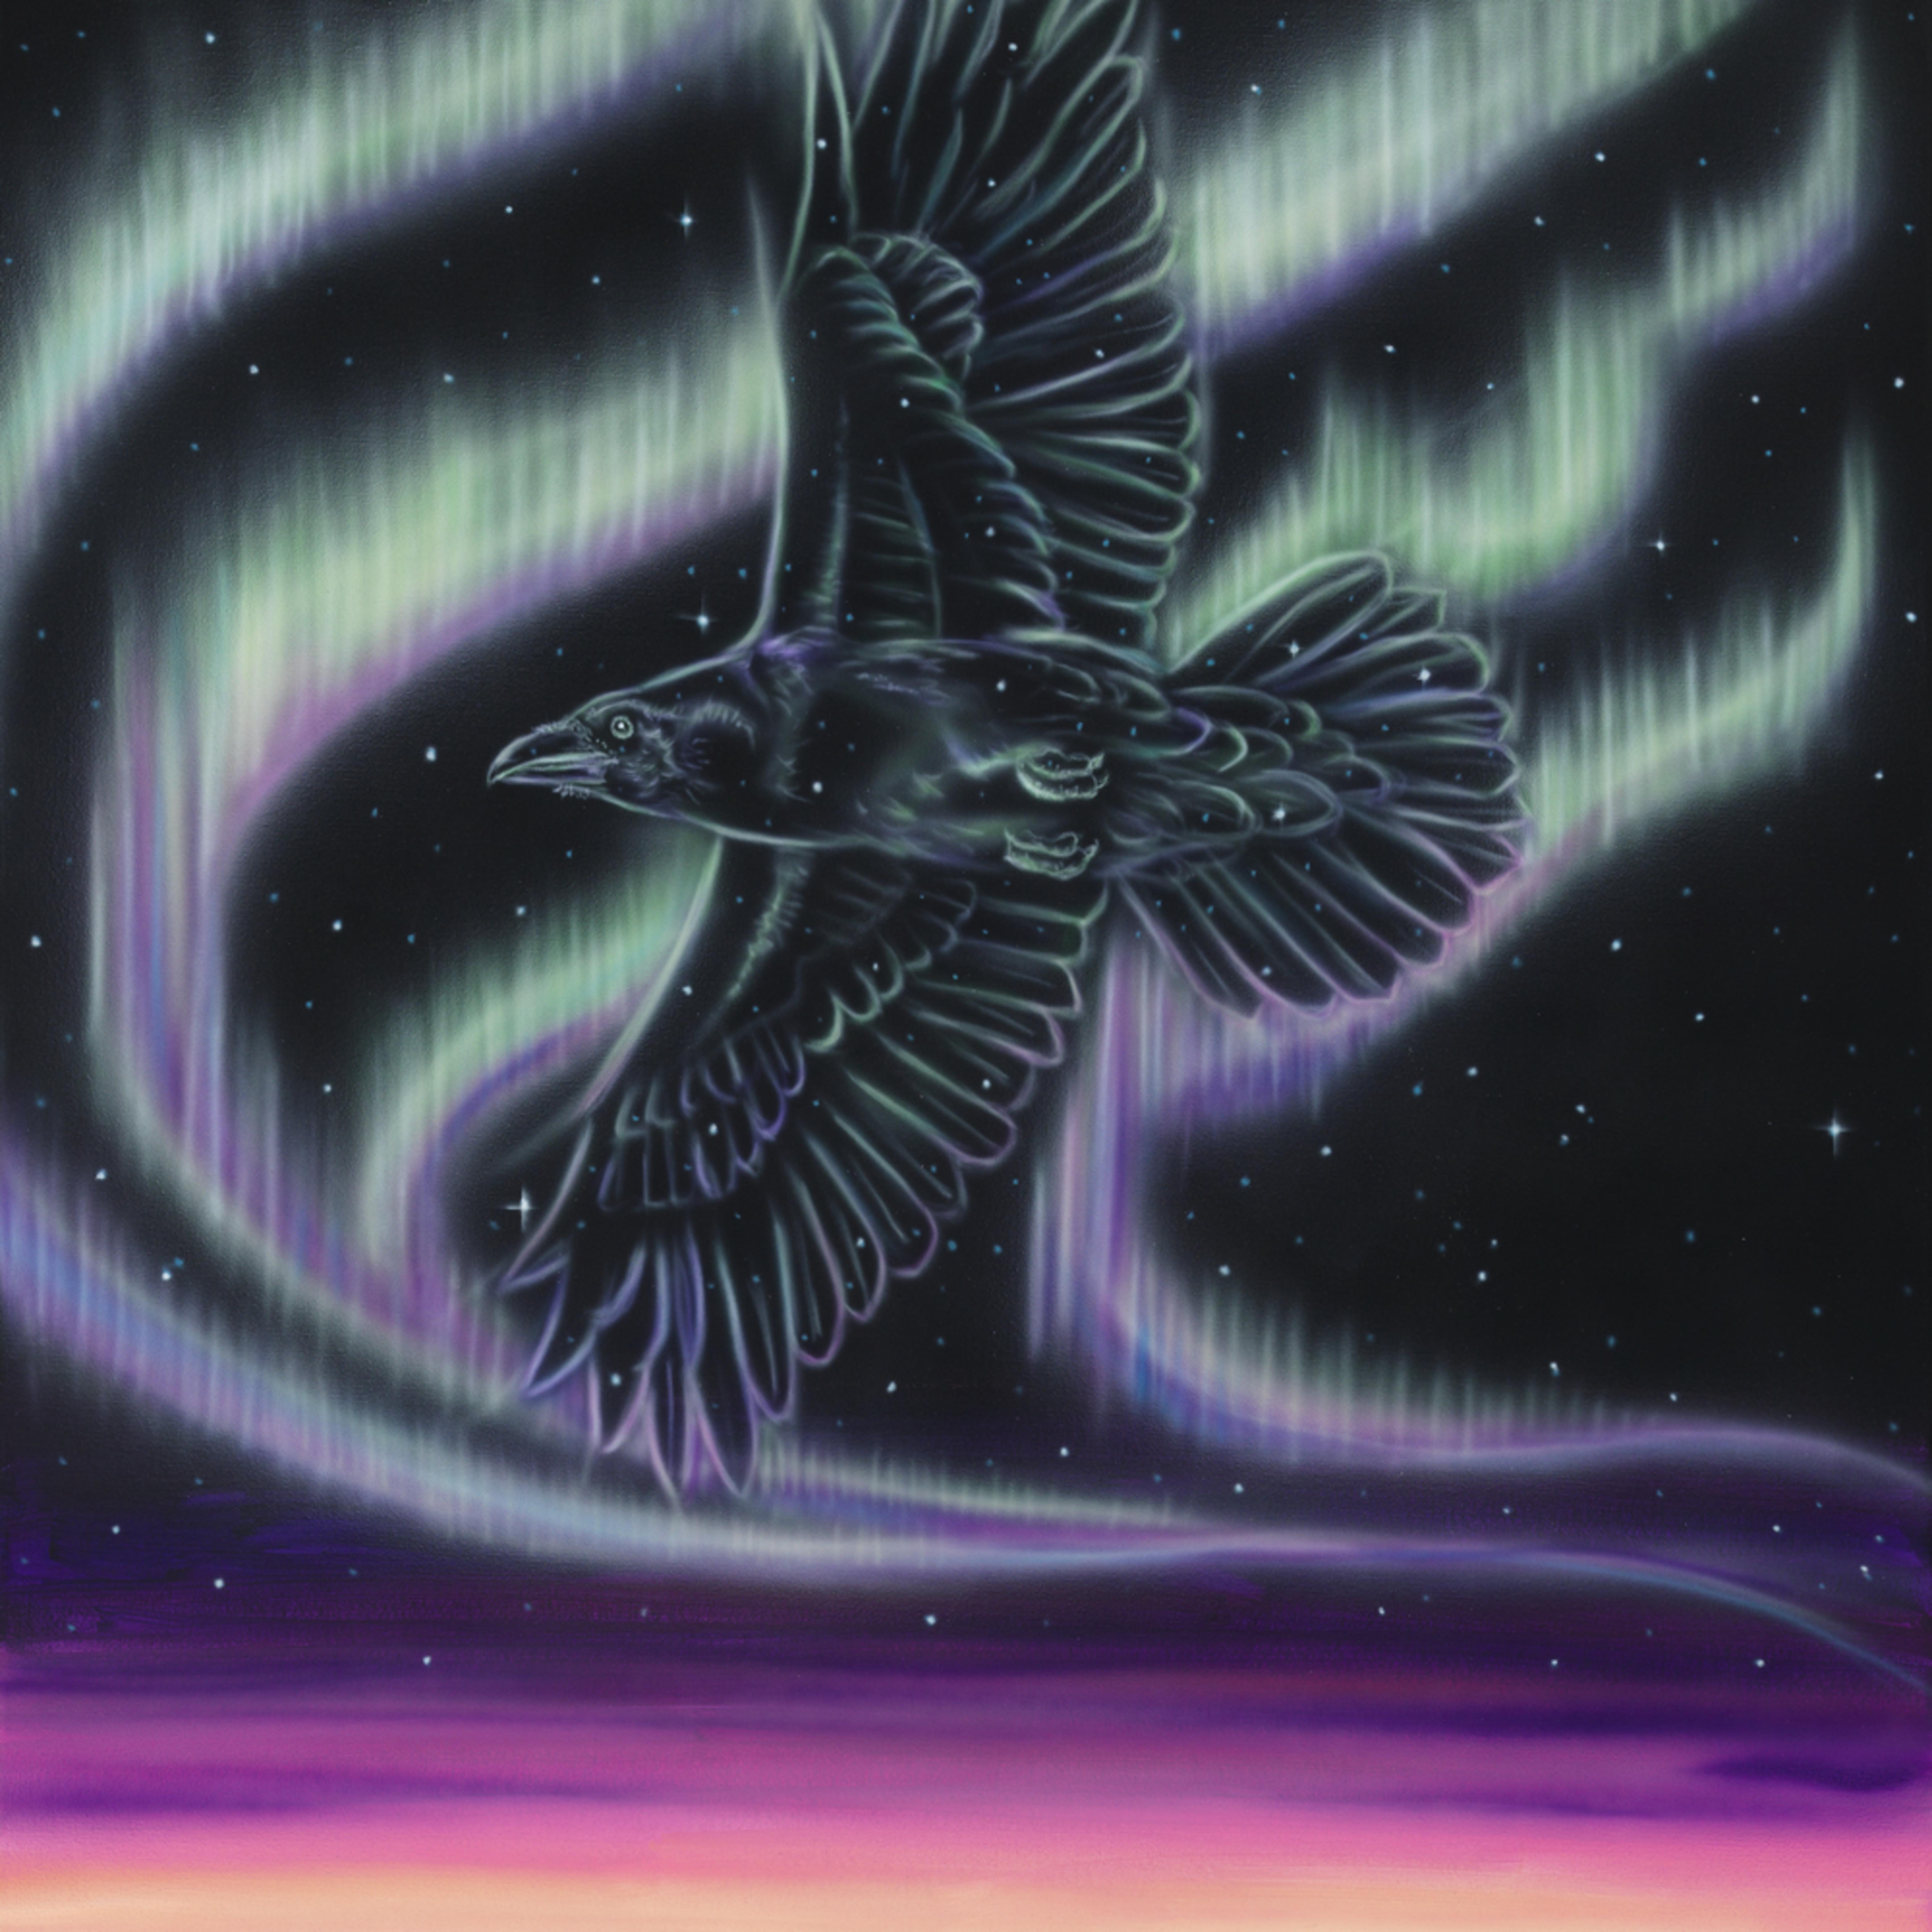 612 skydance raven jd yhmjj0